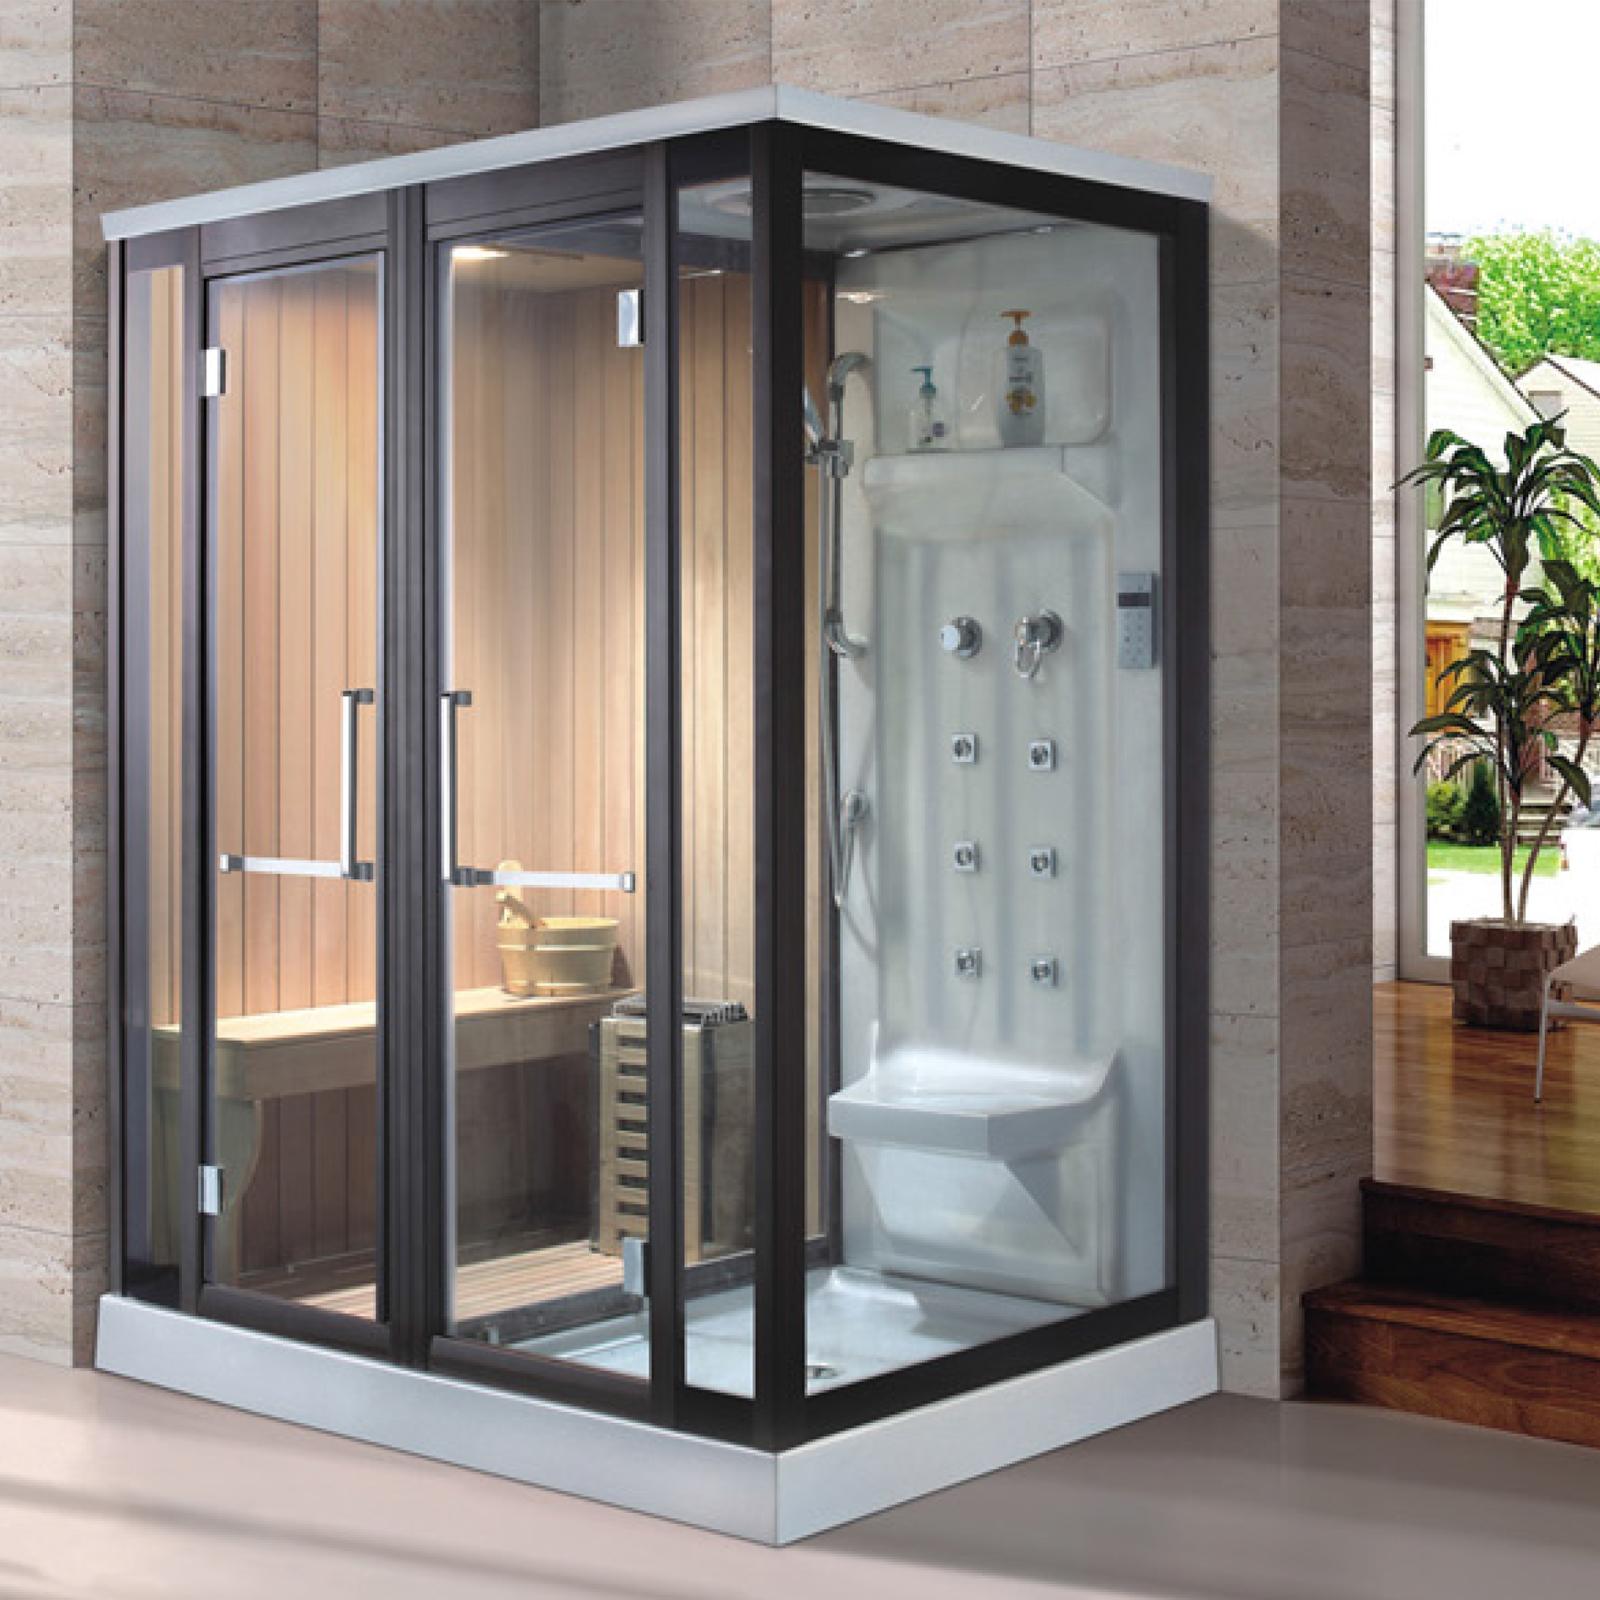 steam sauna shower cubicles combination